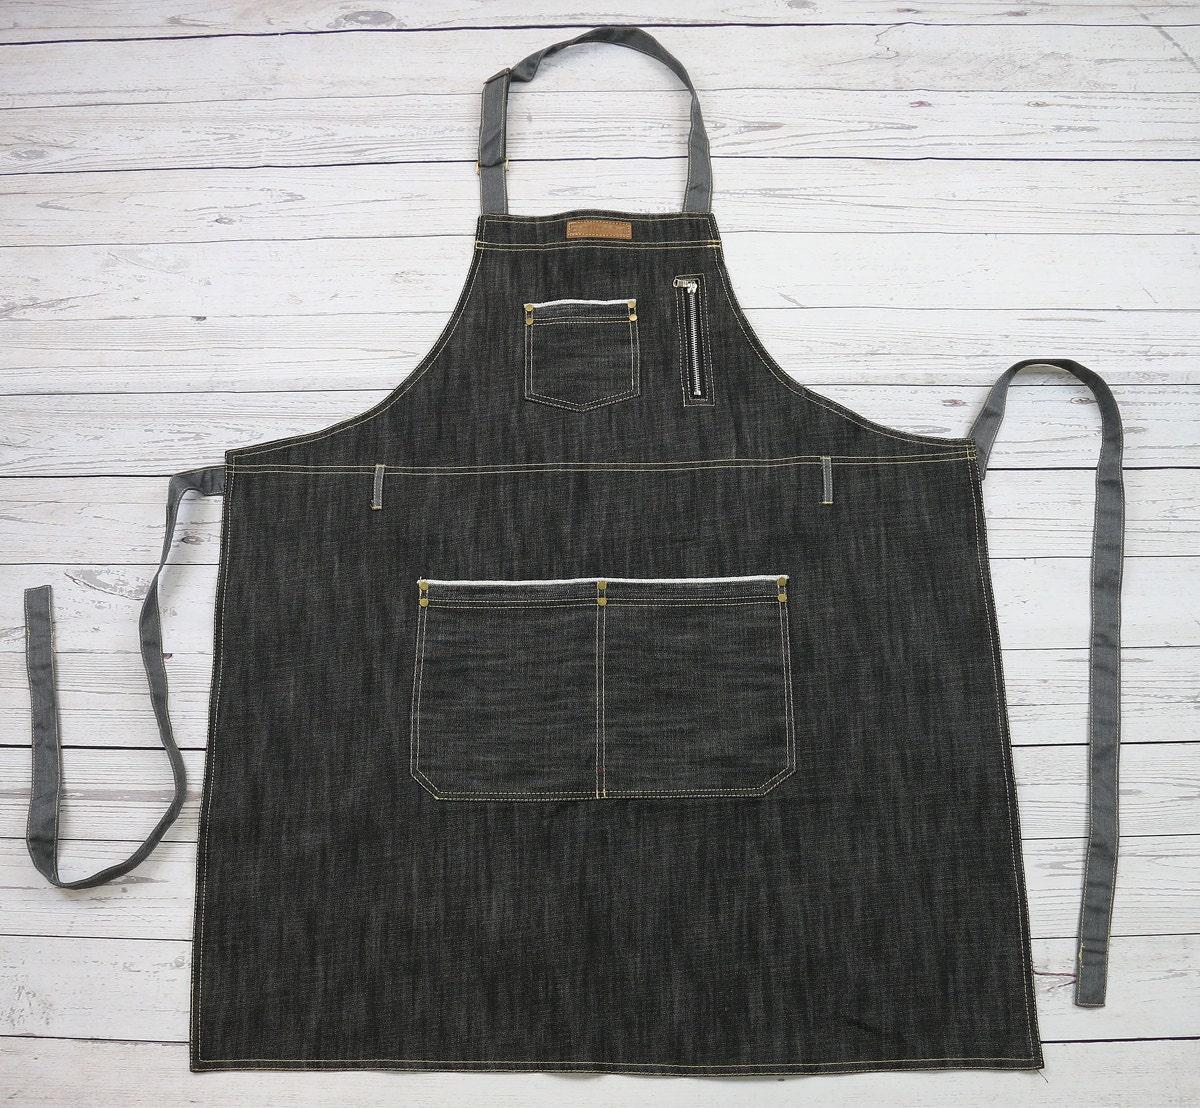 White apron party city - Premium Black Denim Barista Apron Bartender Apron Denim Bib Apron Jeans Apron Bbq Apron U331s